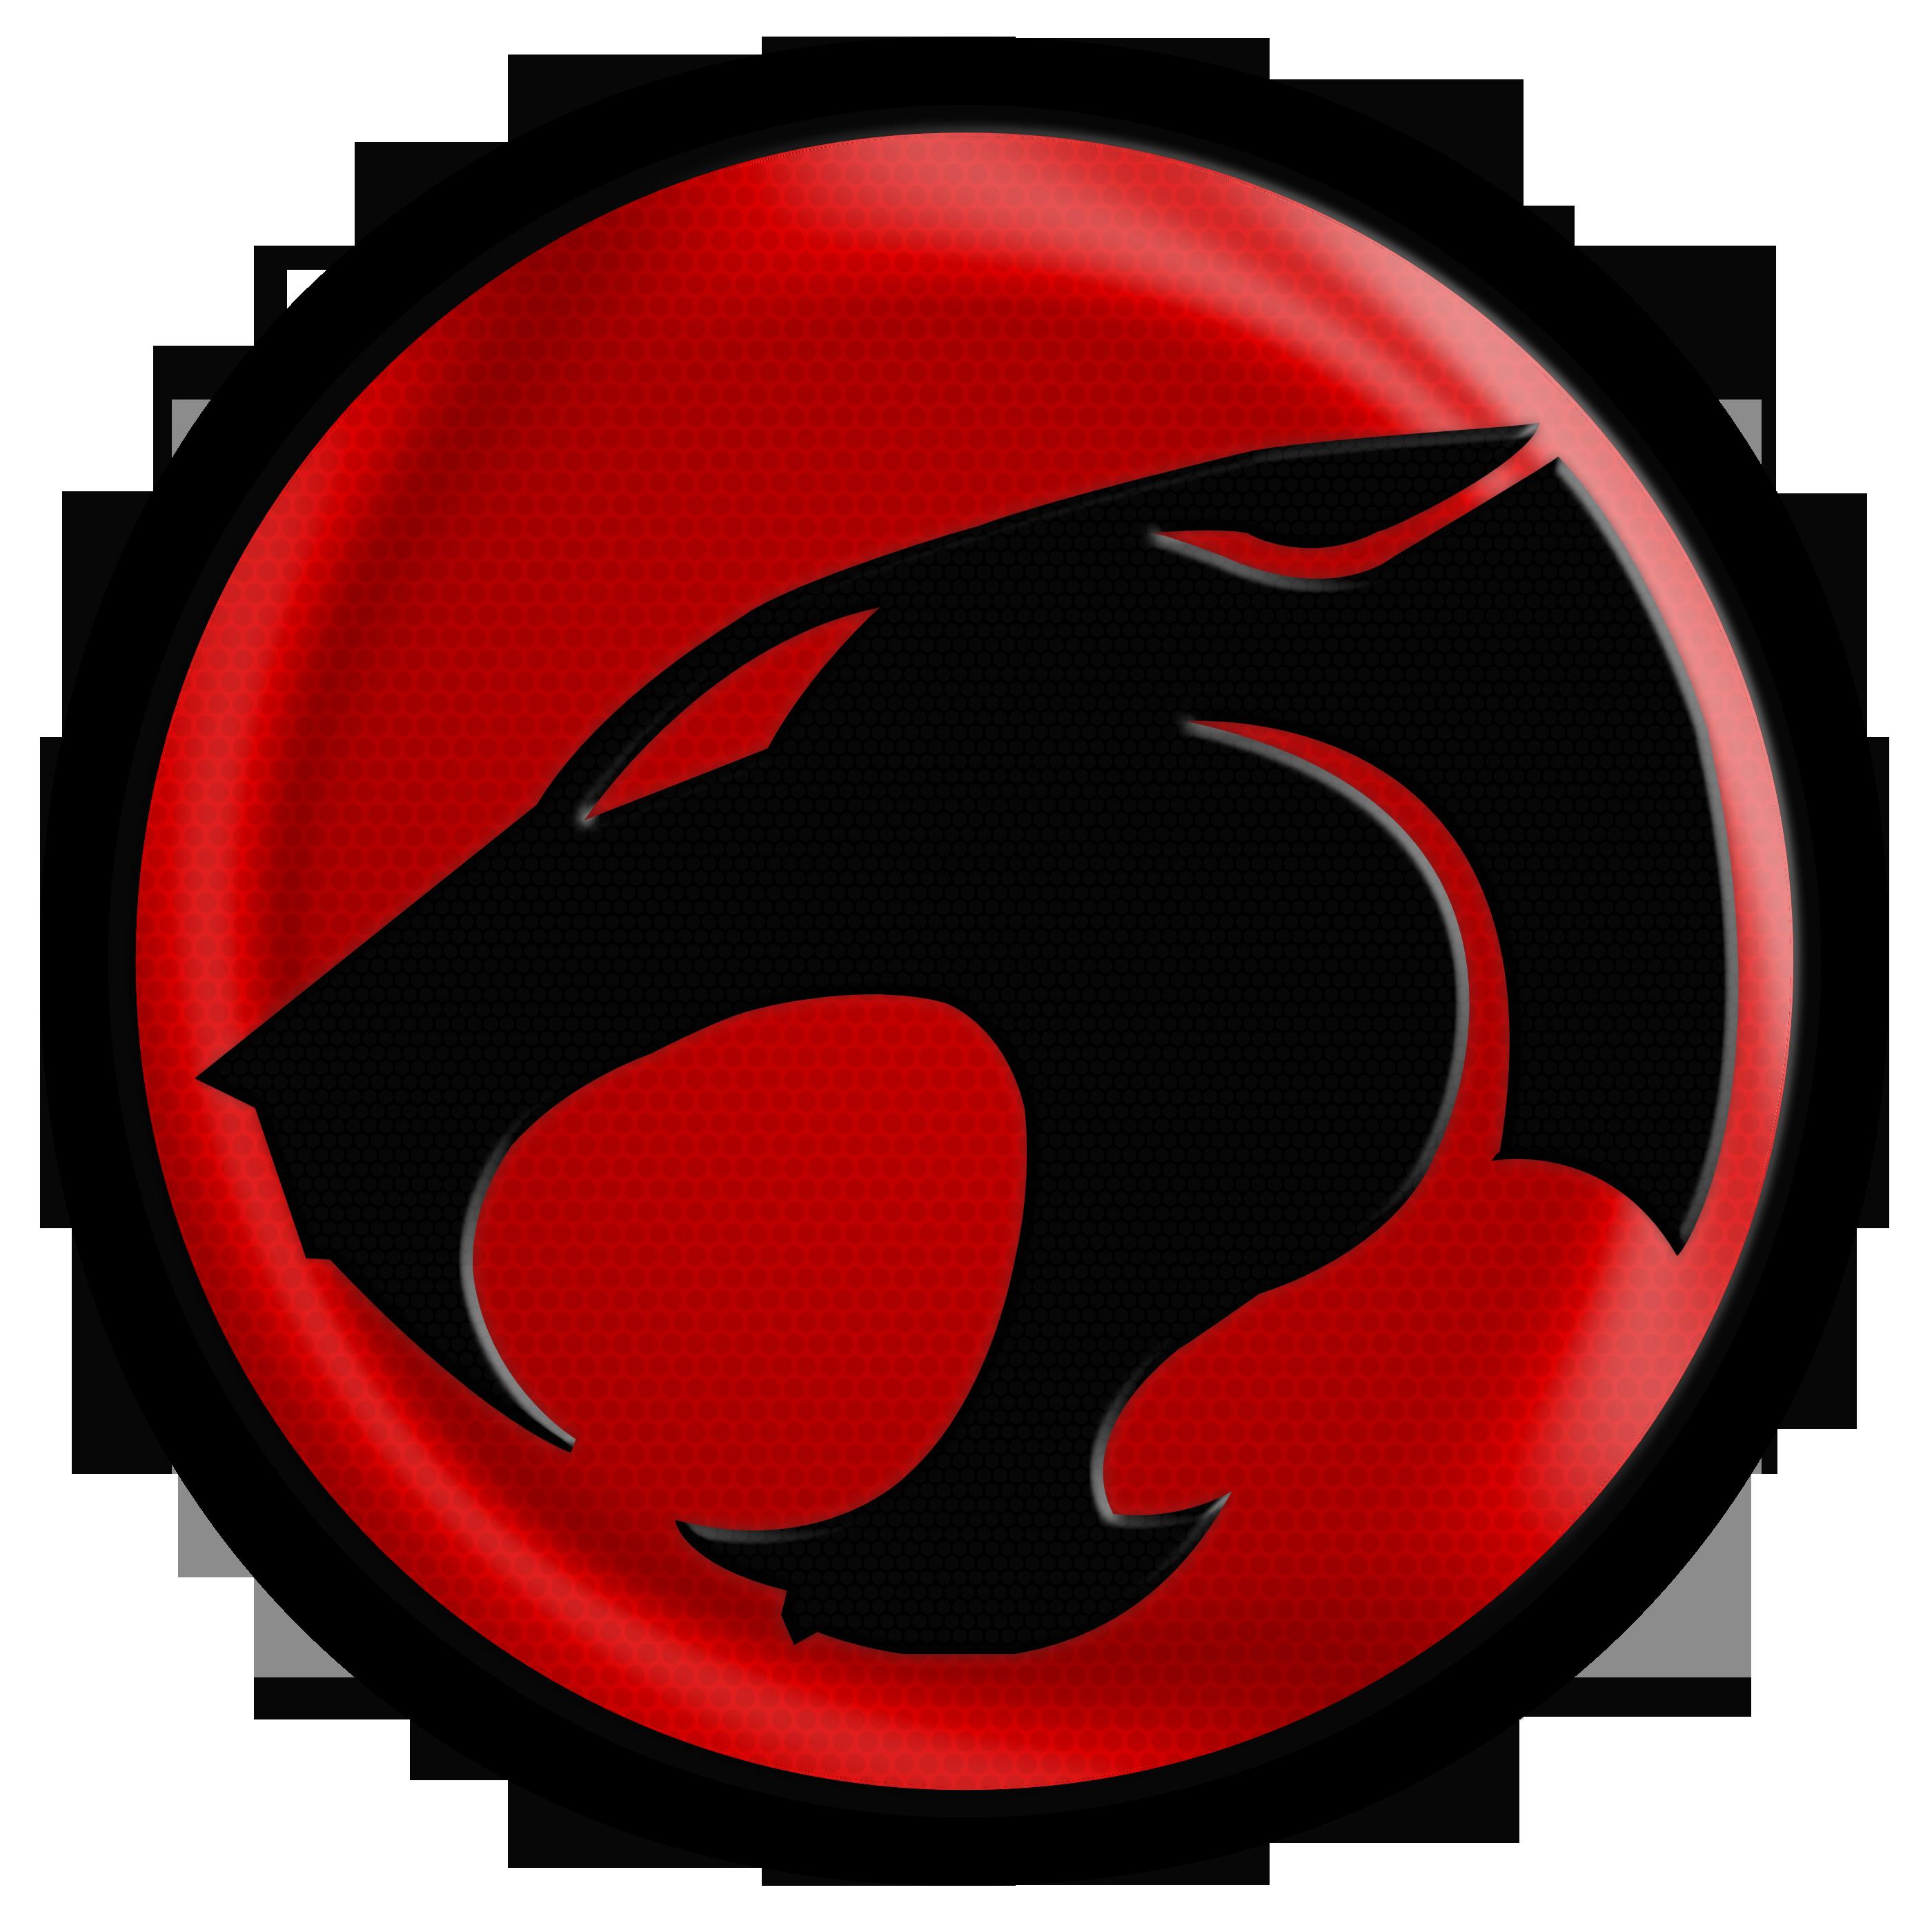 ThunderCats Logo By RussJericho23 On DeviantArt